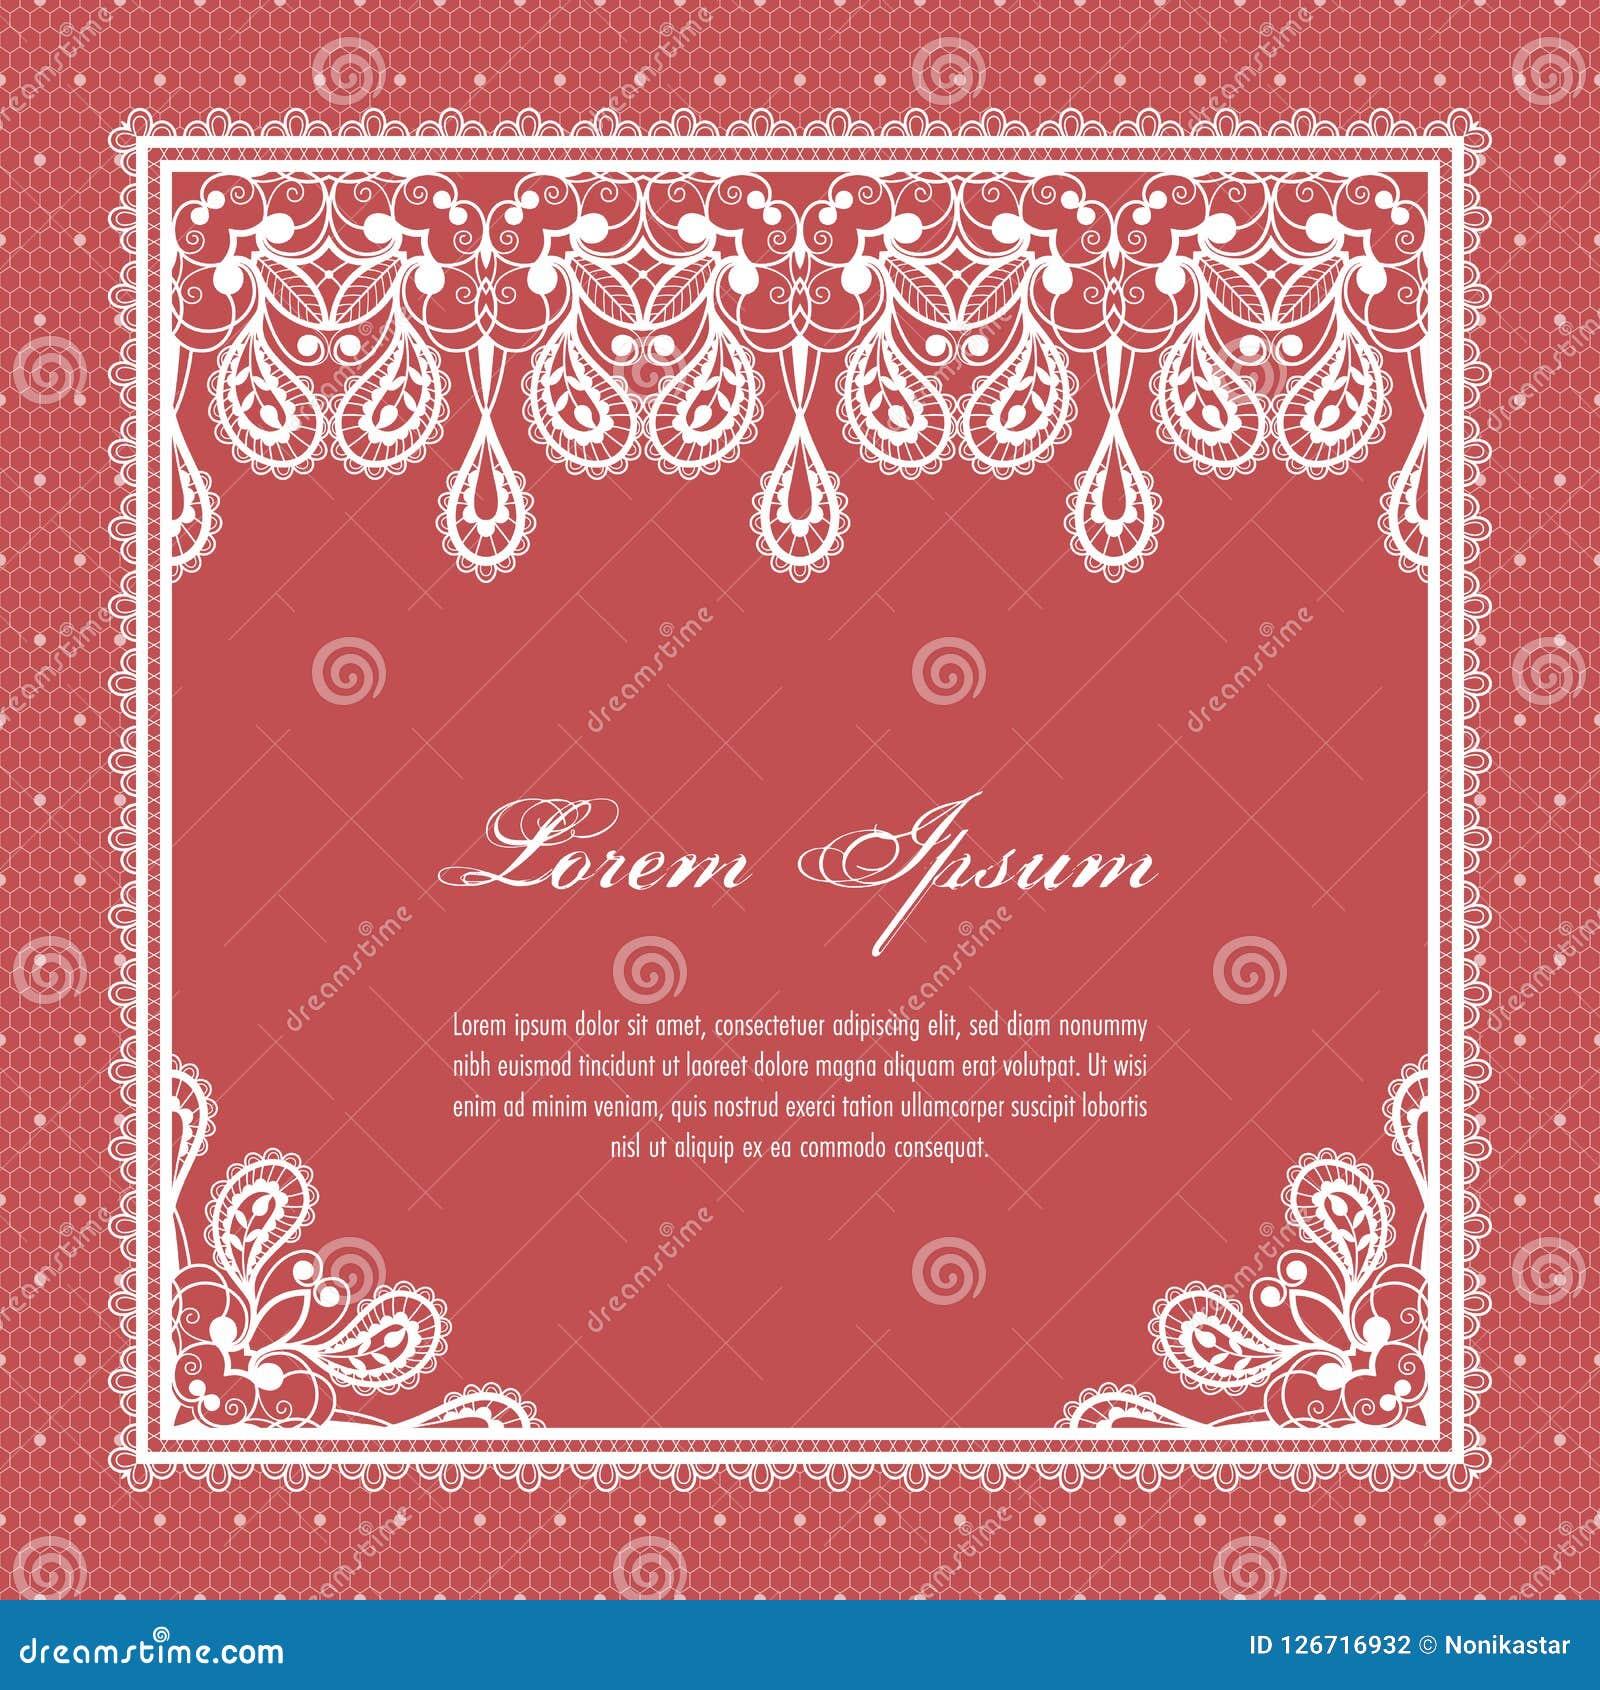 Lace invitation template stock vector. Illustration of graphic ...